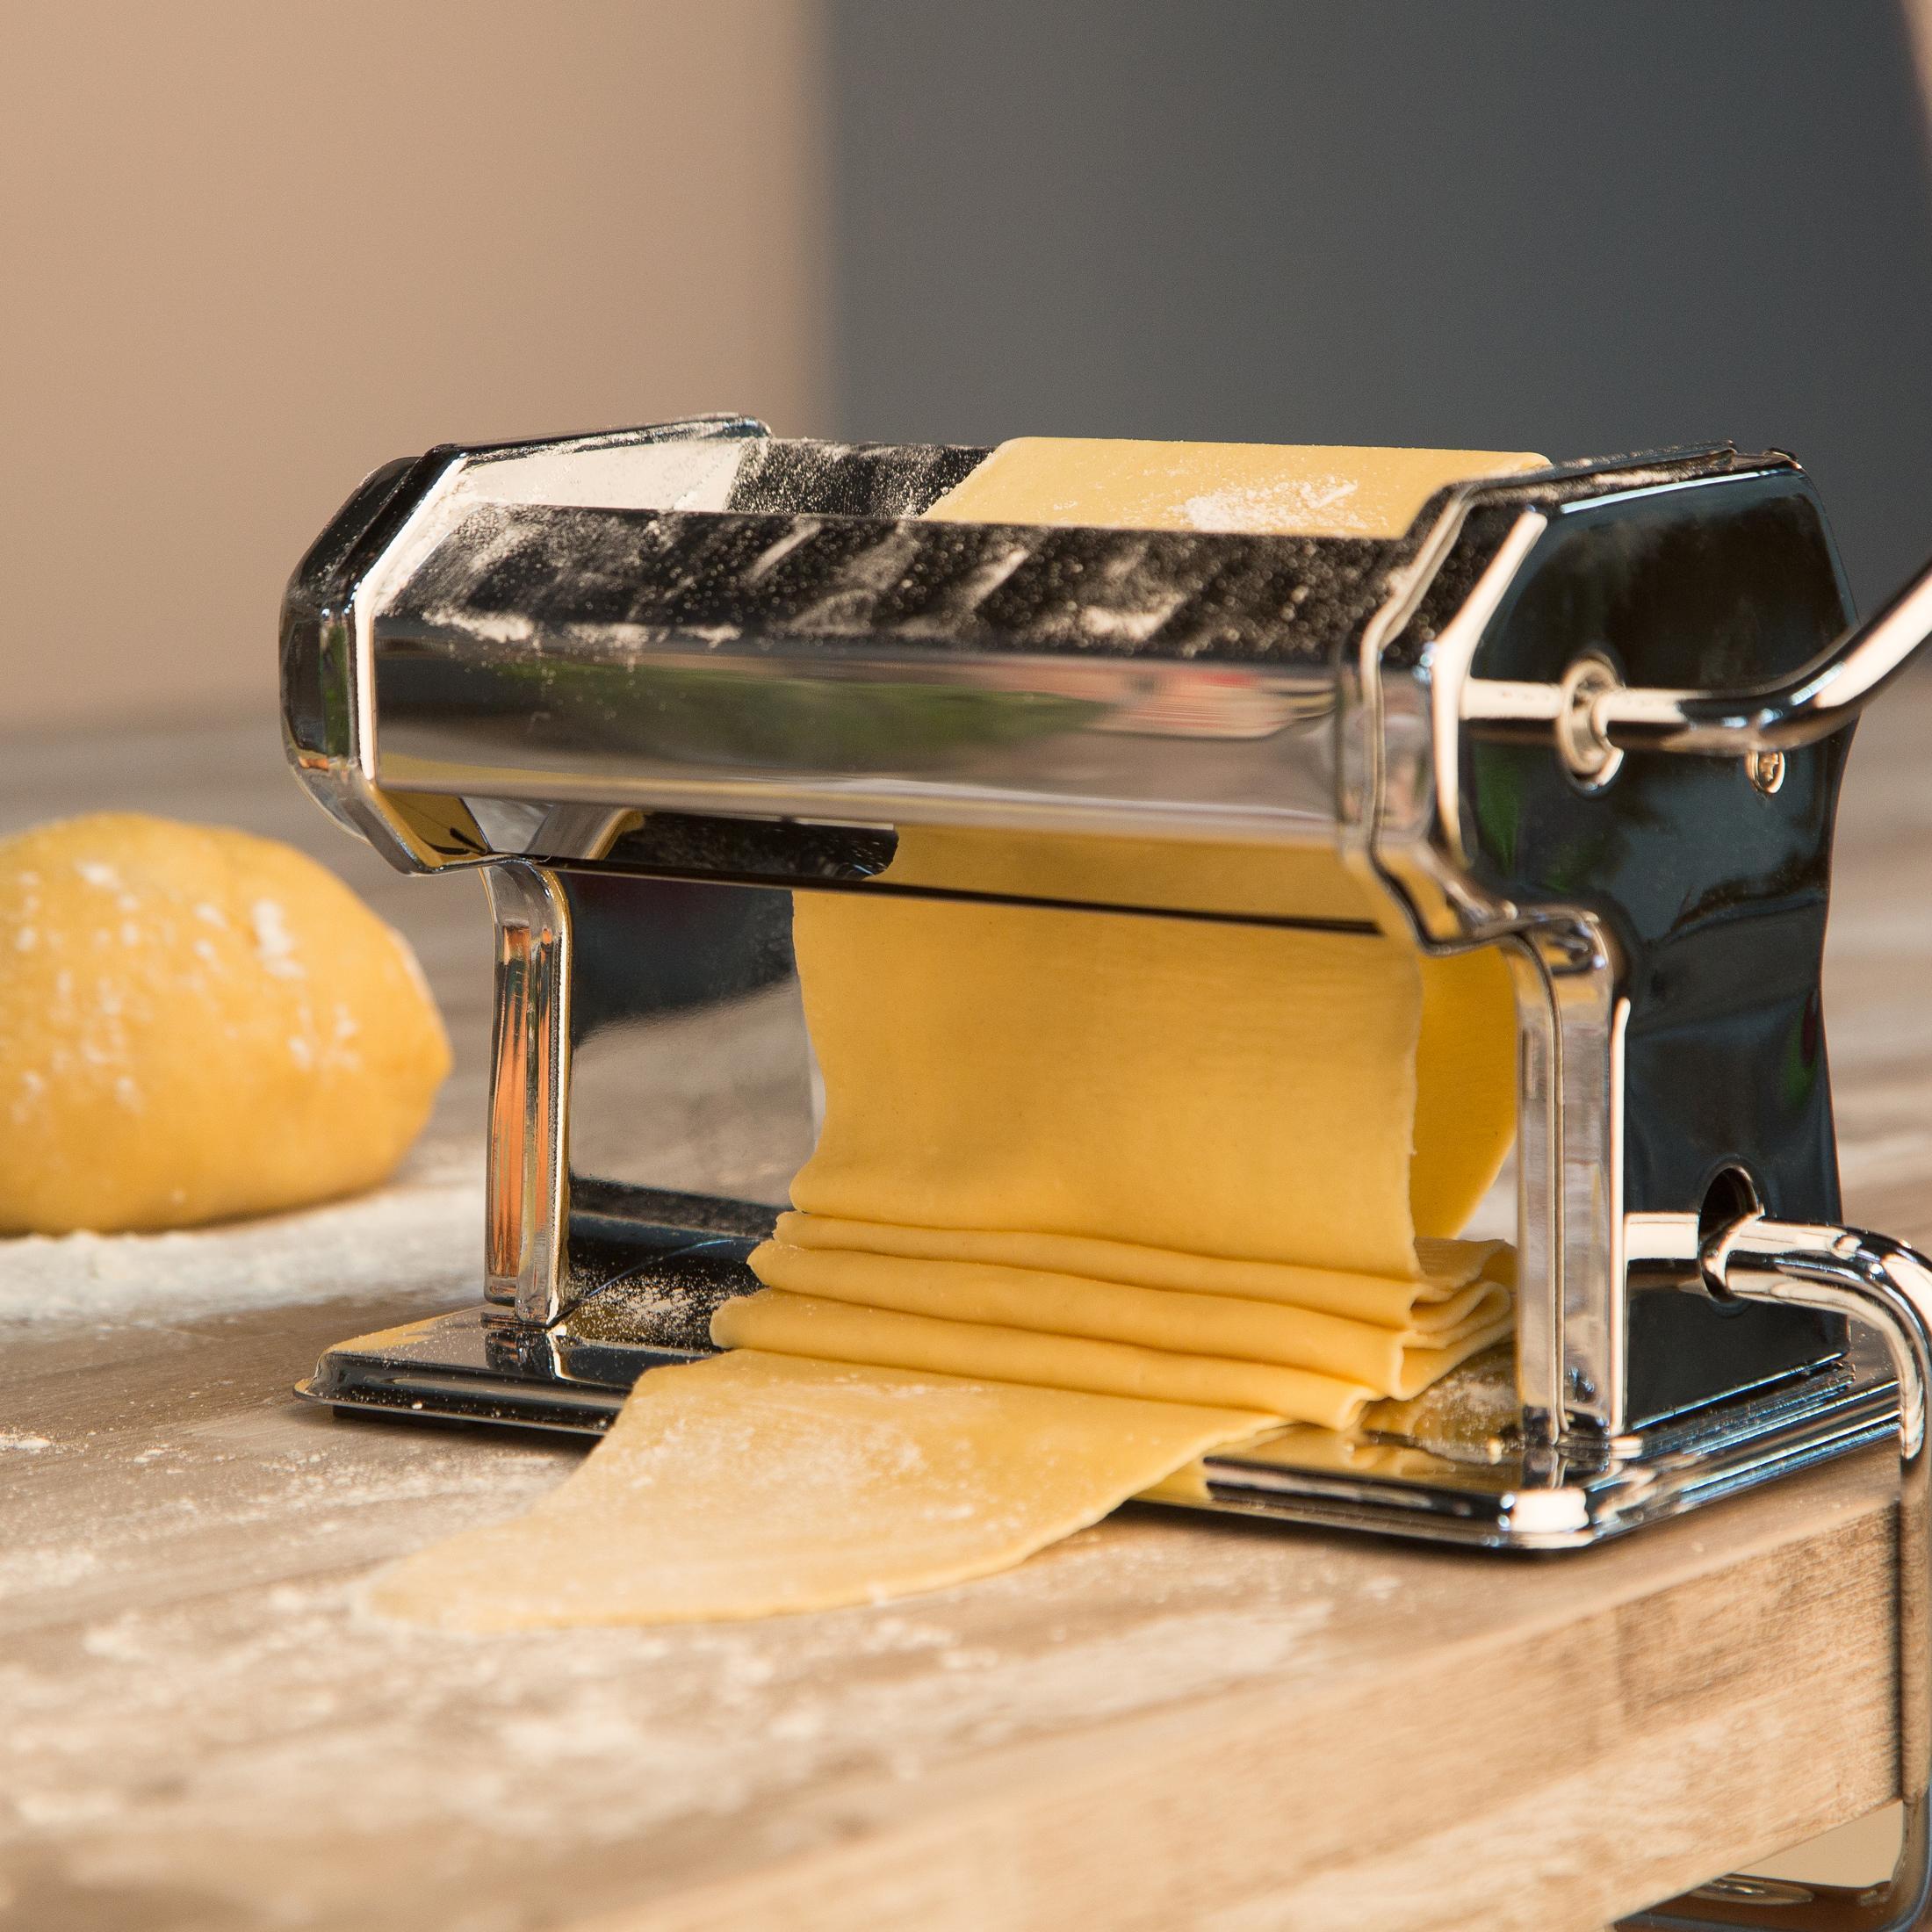 Compra Levivo Máquina para Hacer Pasta Fresca - Máquina de